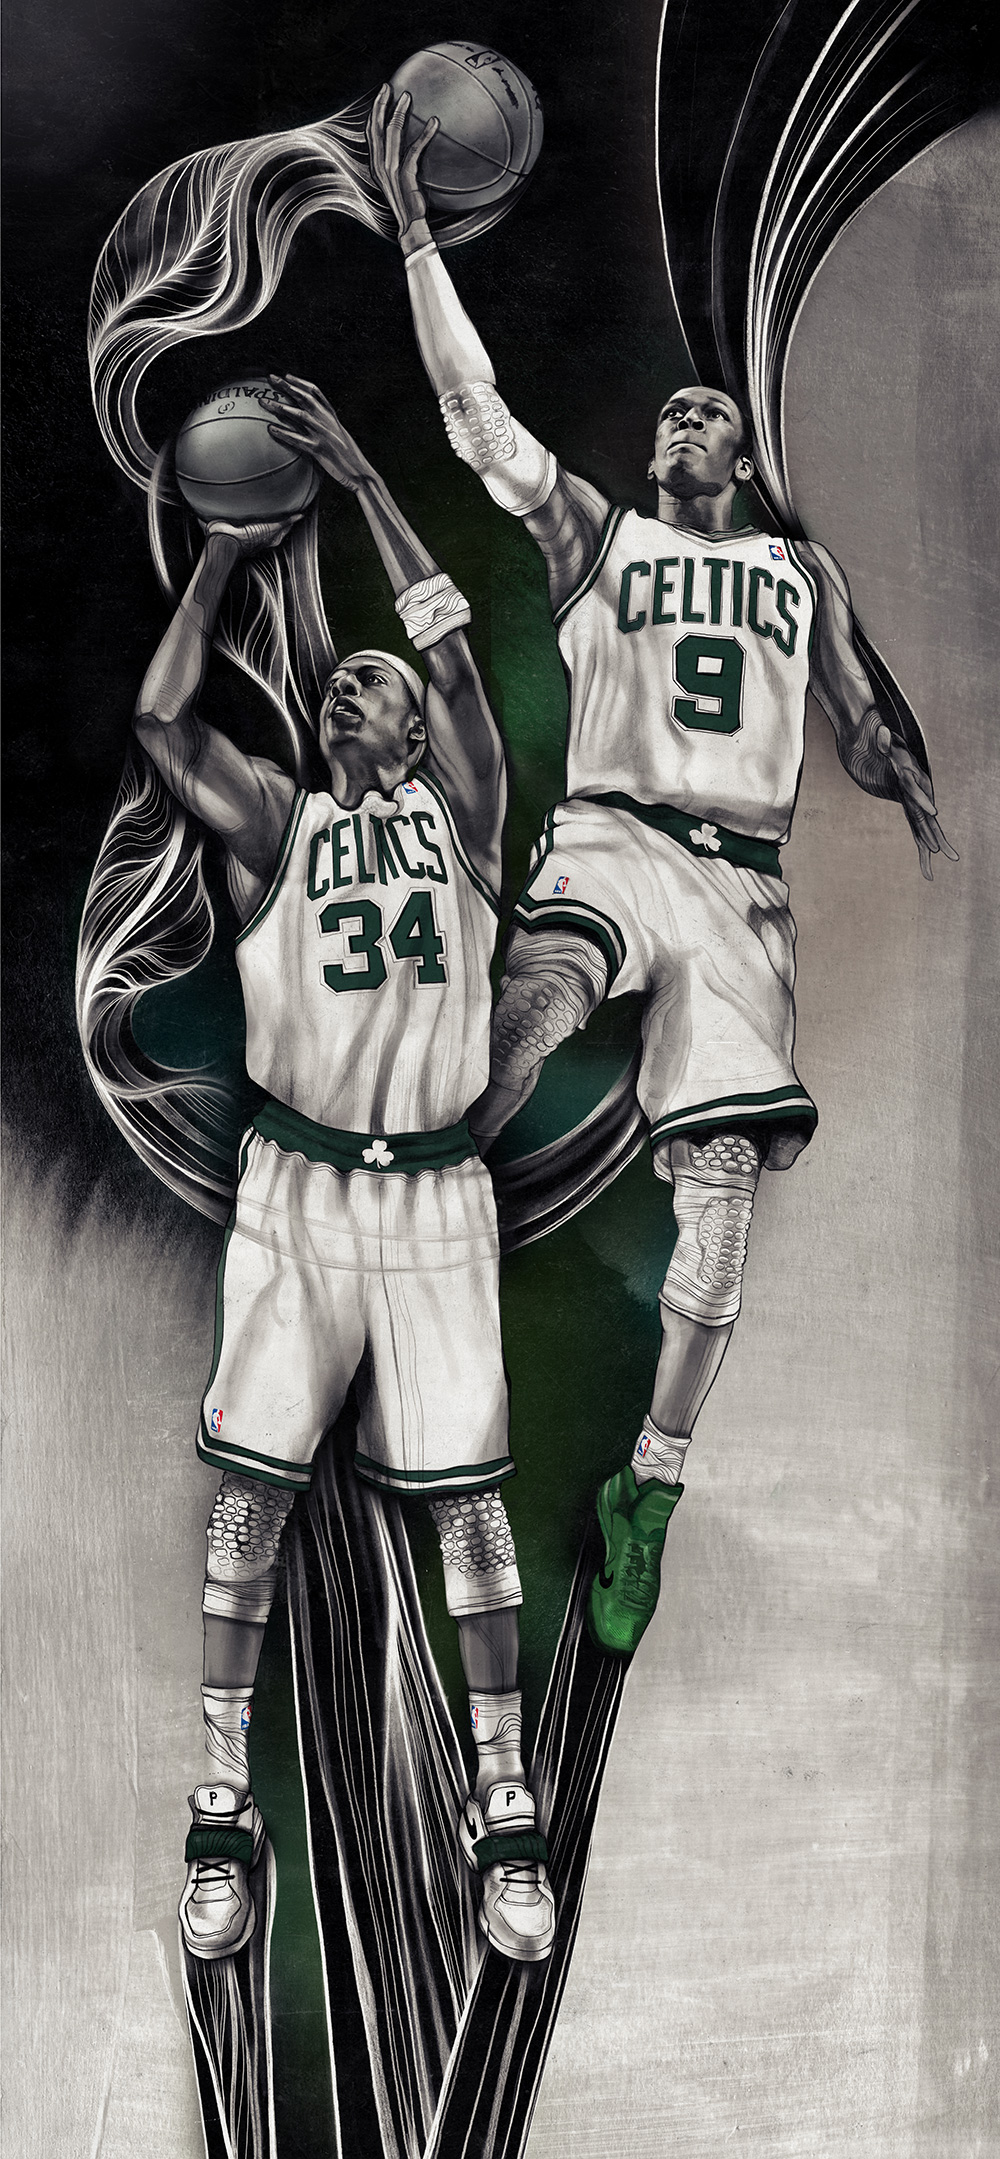 Mural3_Nike_HOH_v3_v09_final_crop.jpg